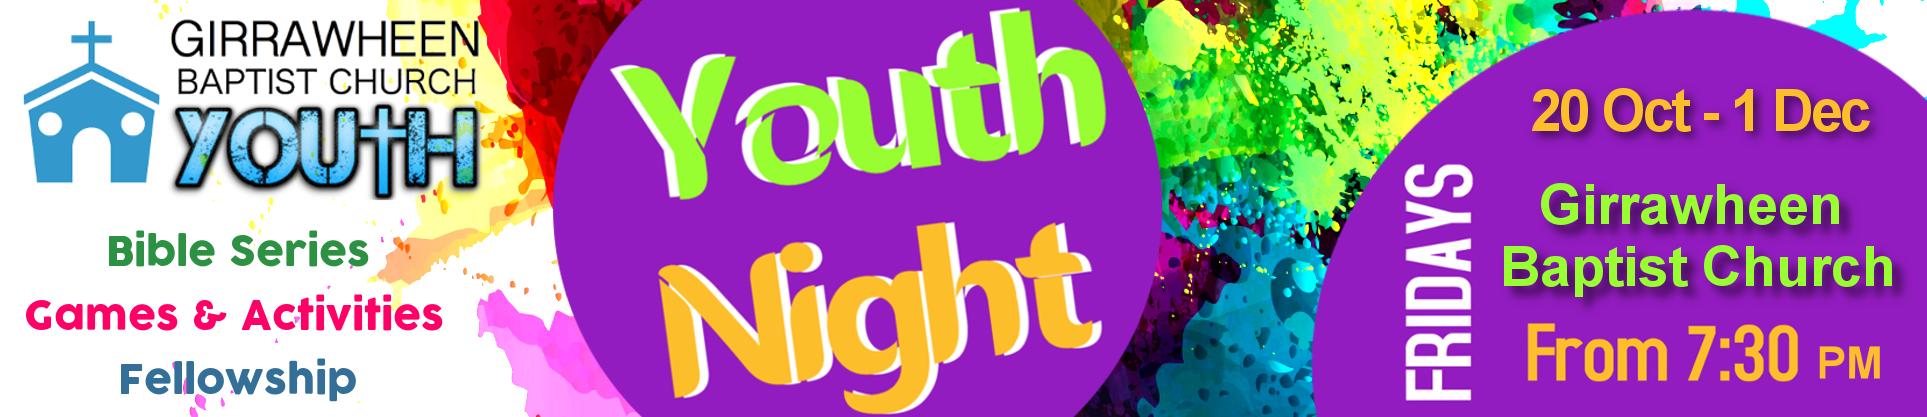 Youth Night 2017 Term 4